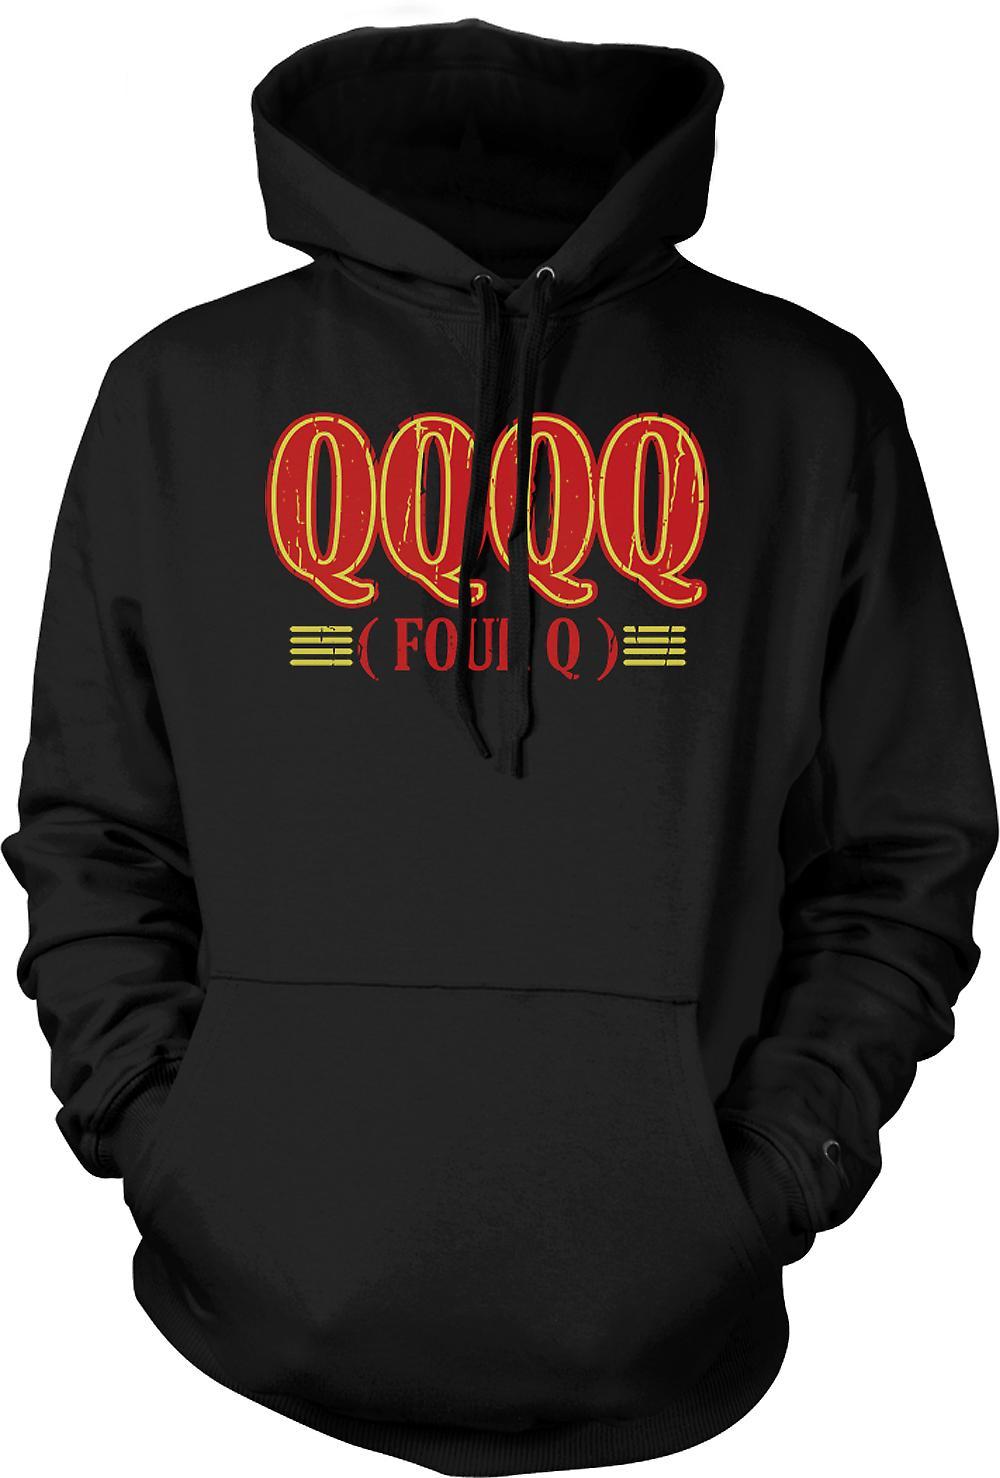 Mens Hoodie - QQQQ Four Q - Funny Crude